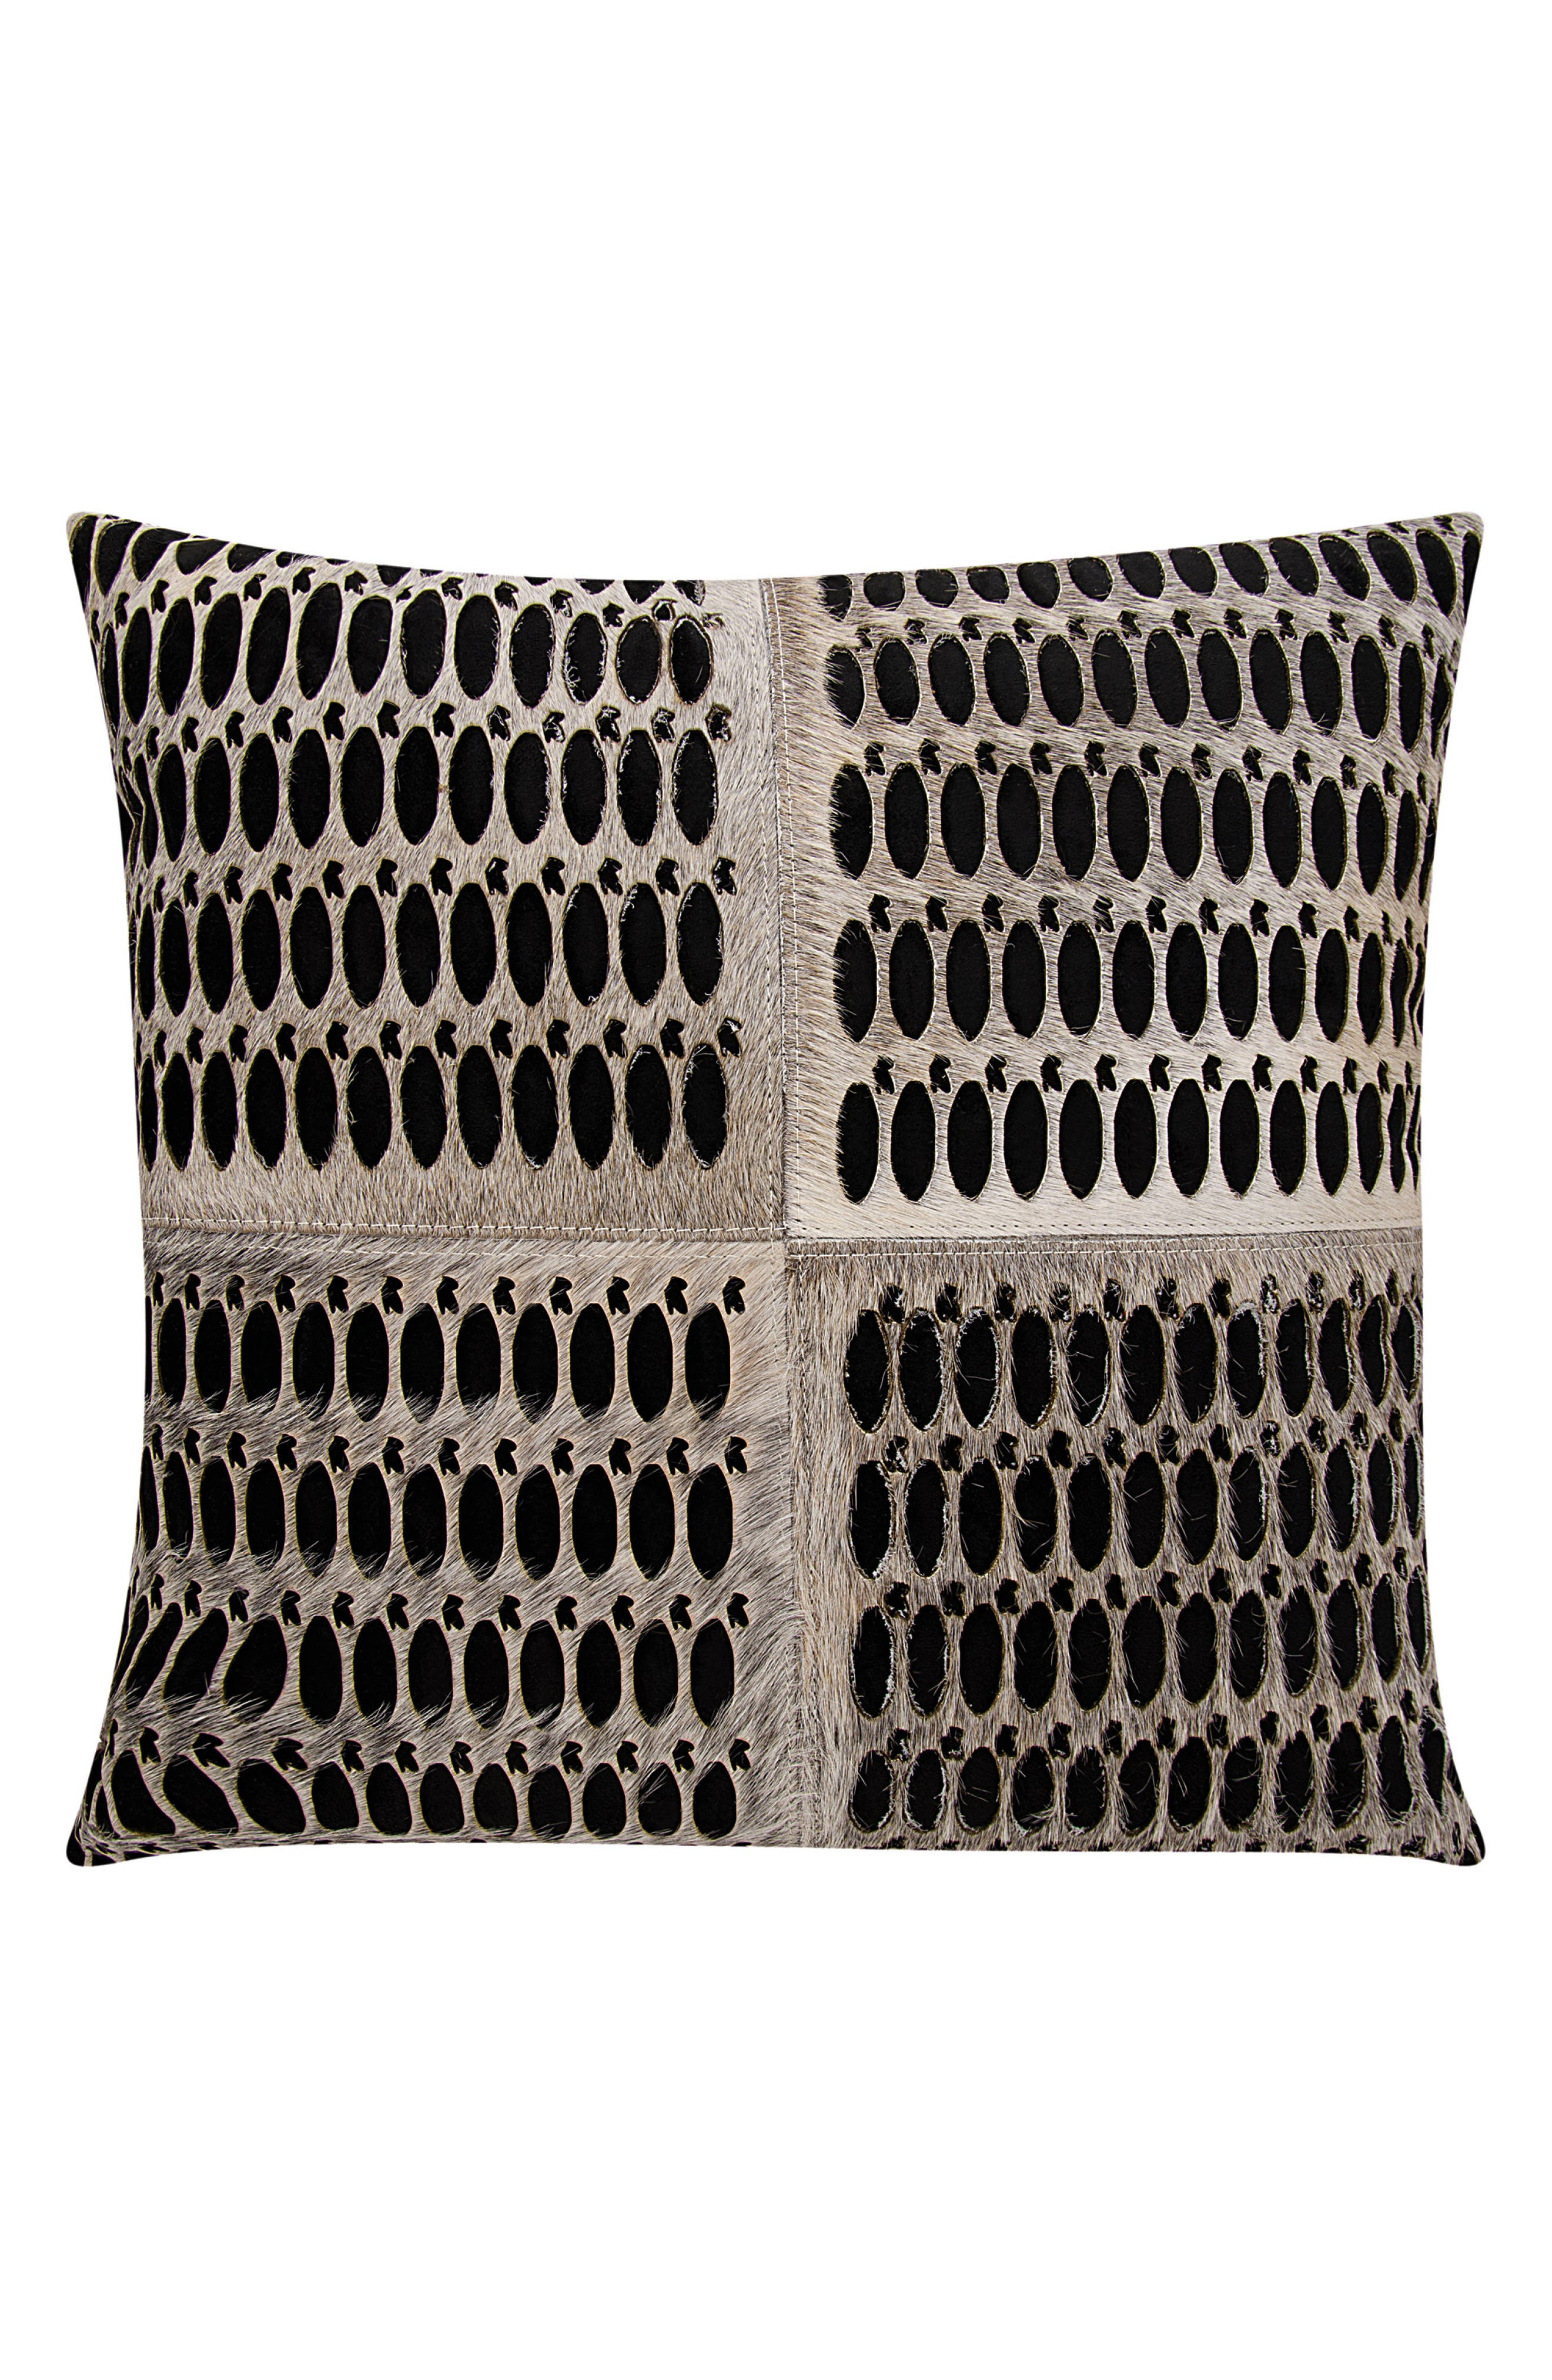 Calf Hair Accent Pillow,                         Main,                         color, Grey